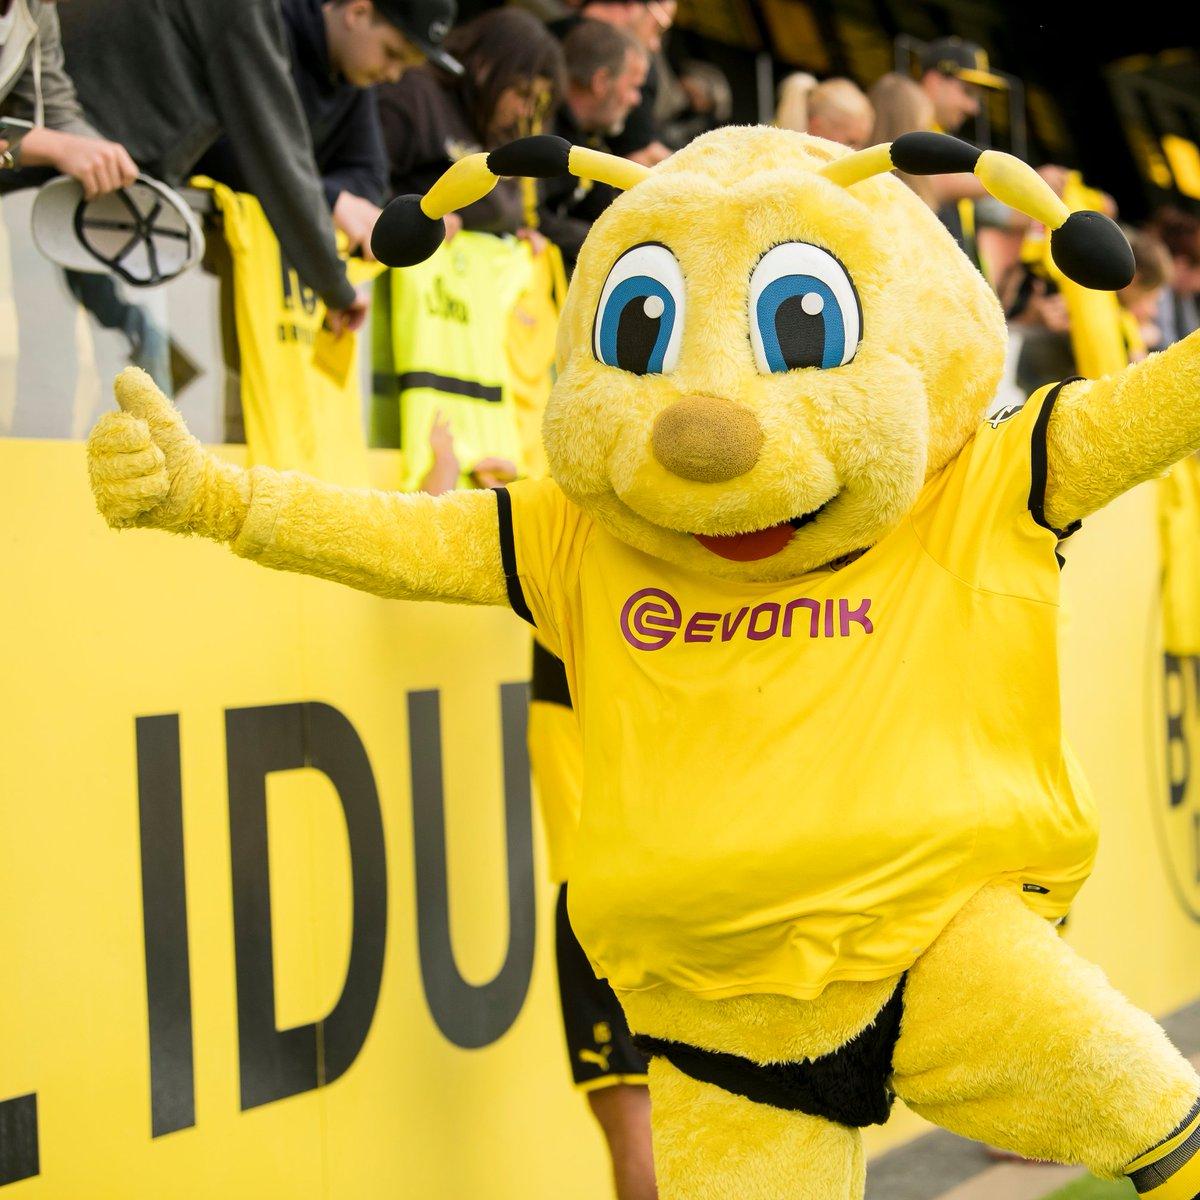 Borussia Dortmund On Twitter Happy 15th Birthday To Everyone S Favorite Mascot Emma